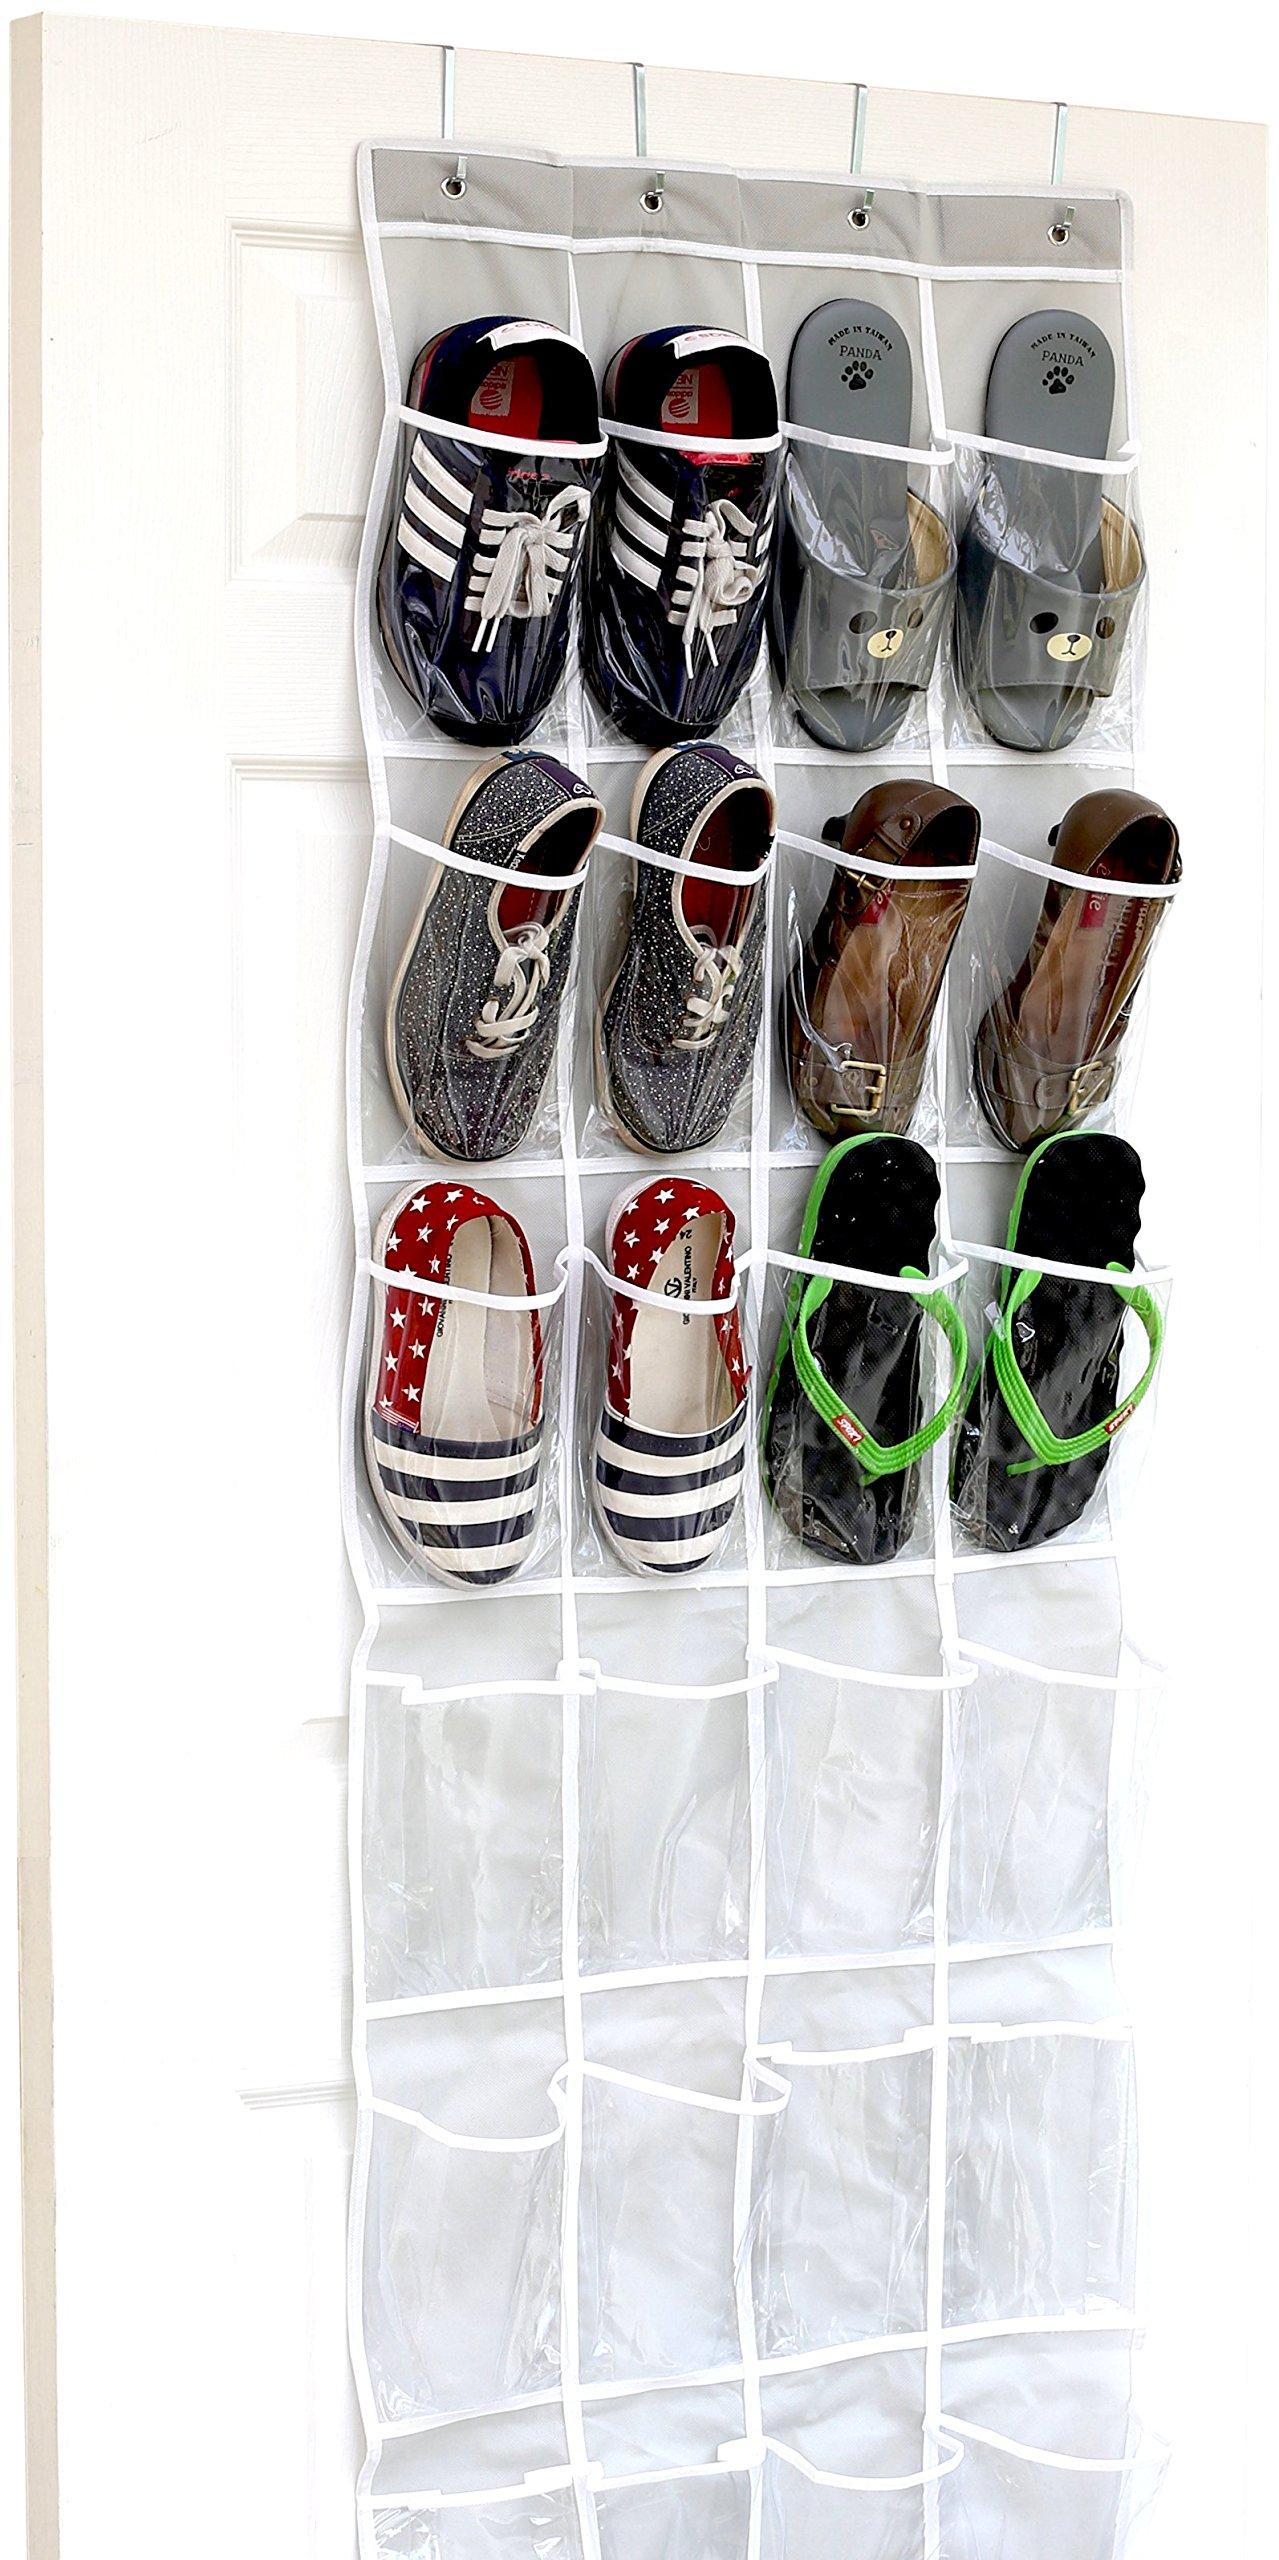 24 pockets simplehouseware crystal clear over the door hanging shoe organizer 695638437191 ebay. Black Bedroom Furniture Sets. Home Design Ideas